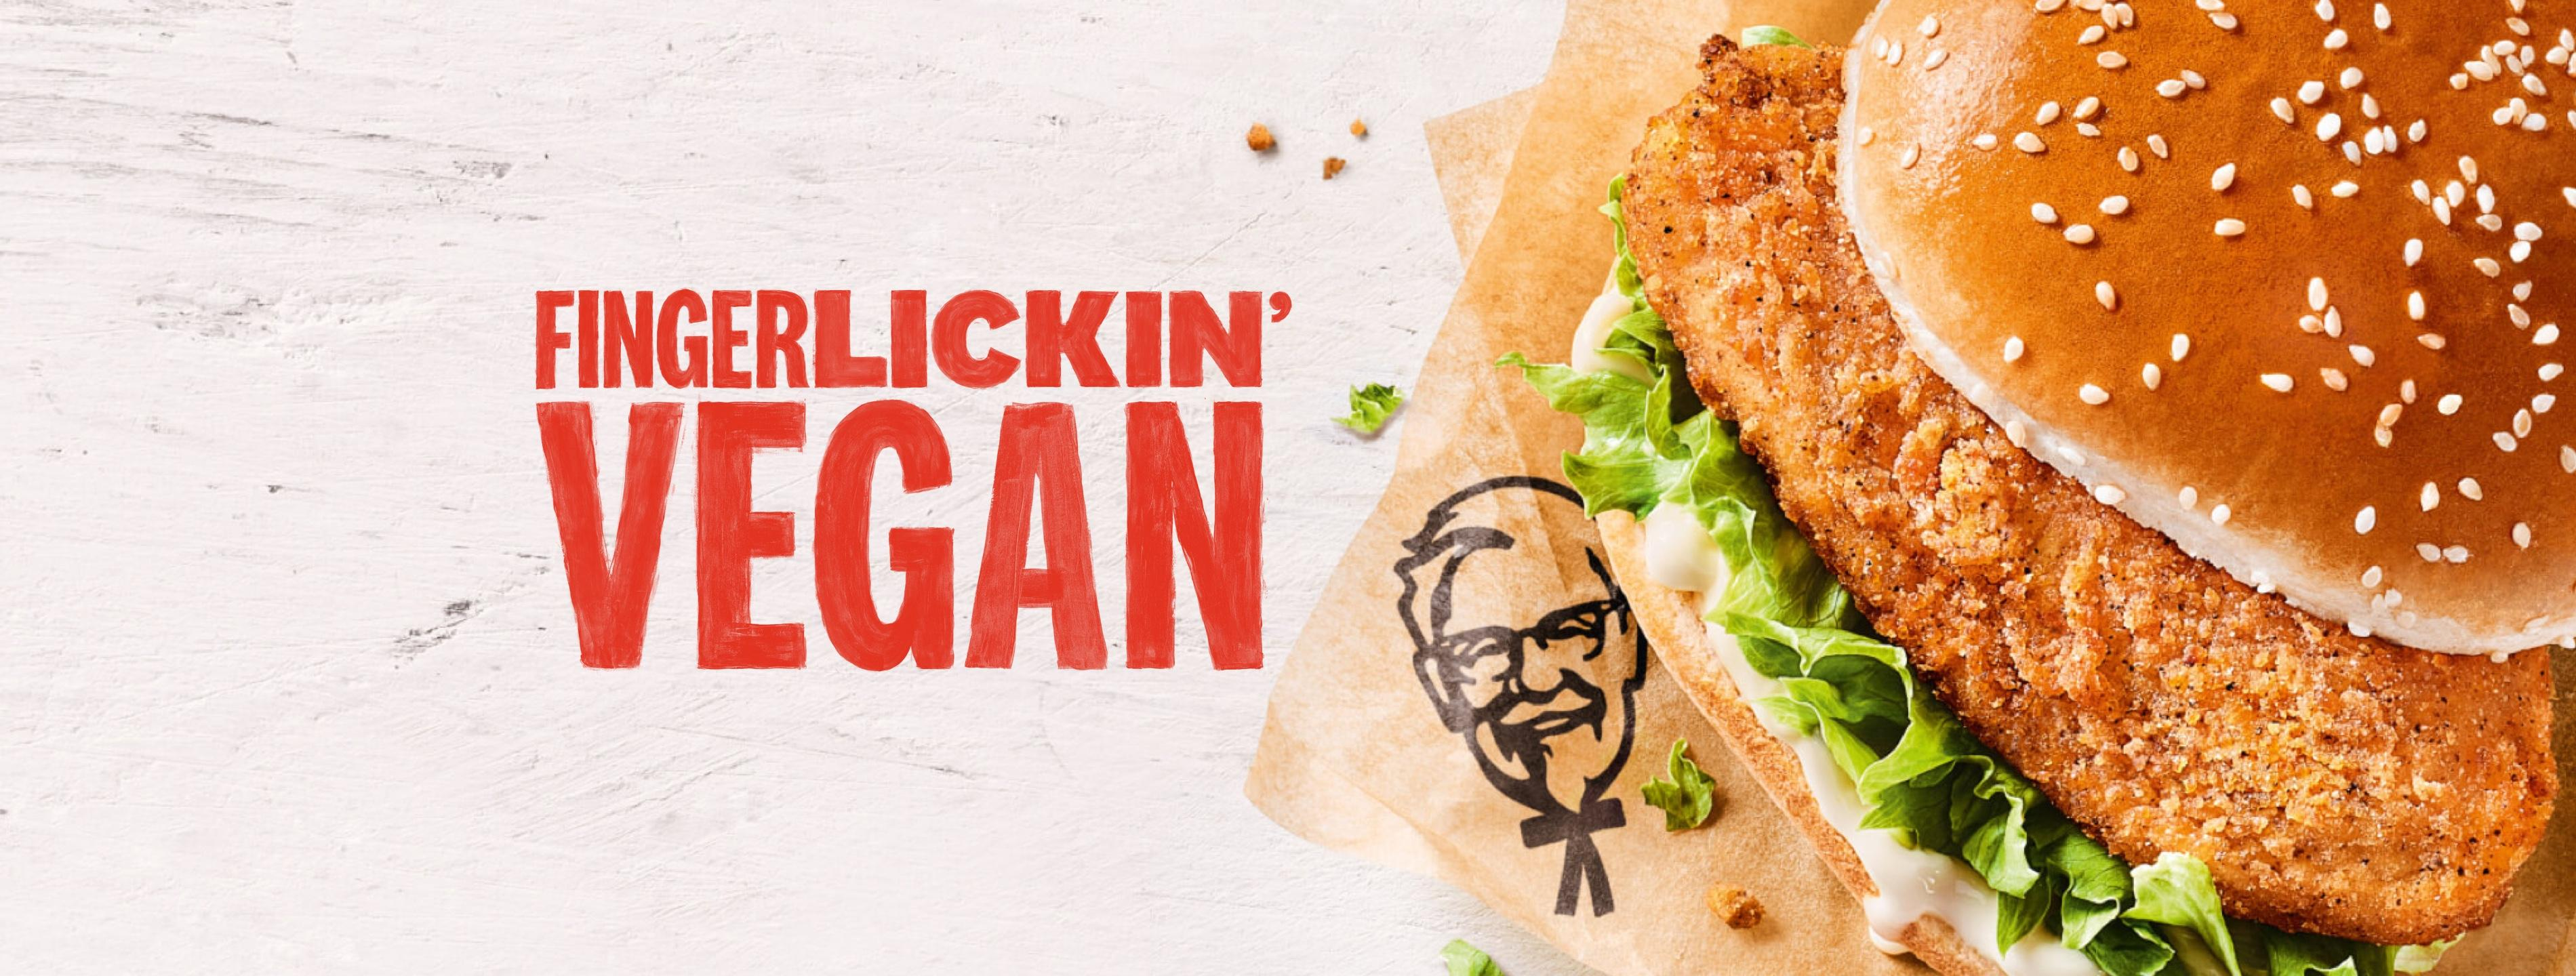 KFC Desktop_vegan_1